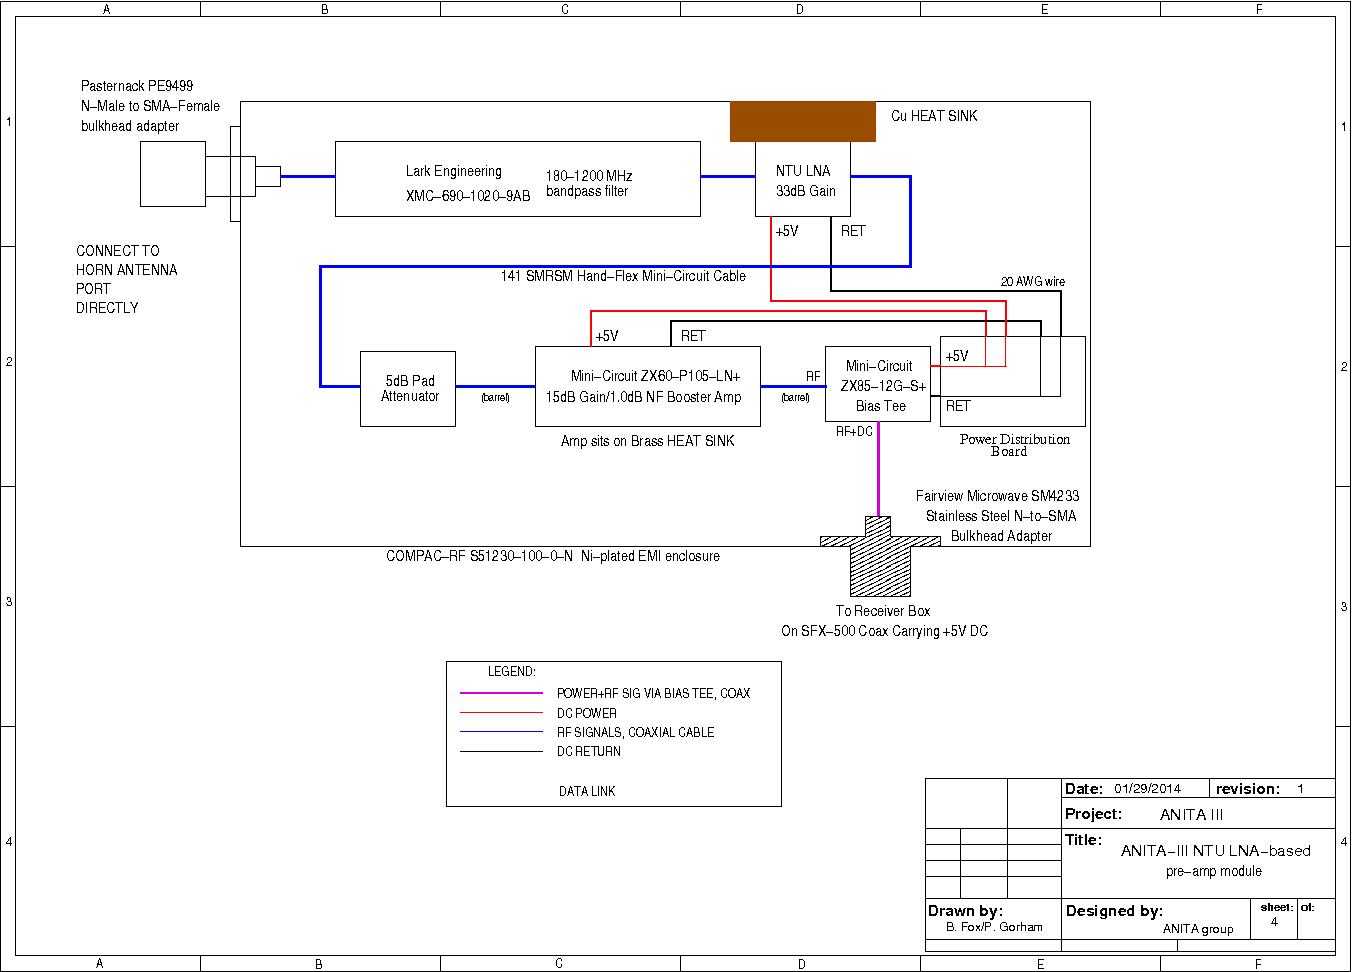 Collection Of NTU-based AMPA Development - January 29, 2014